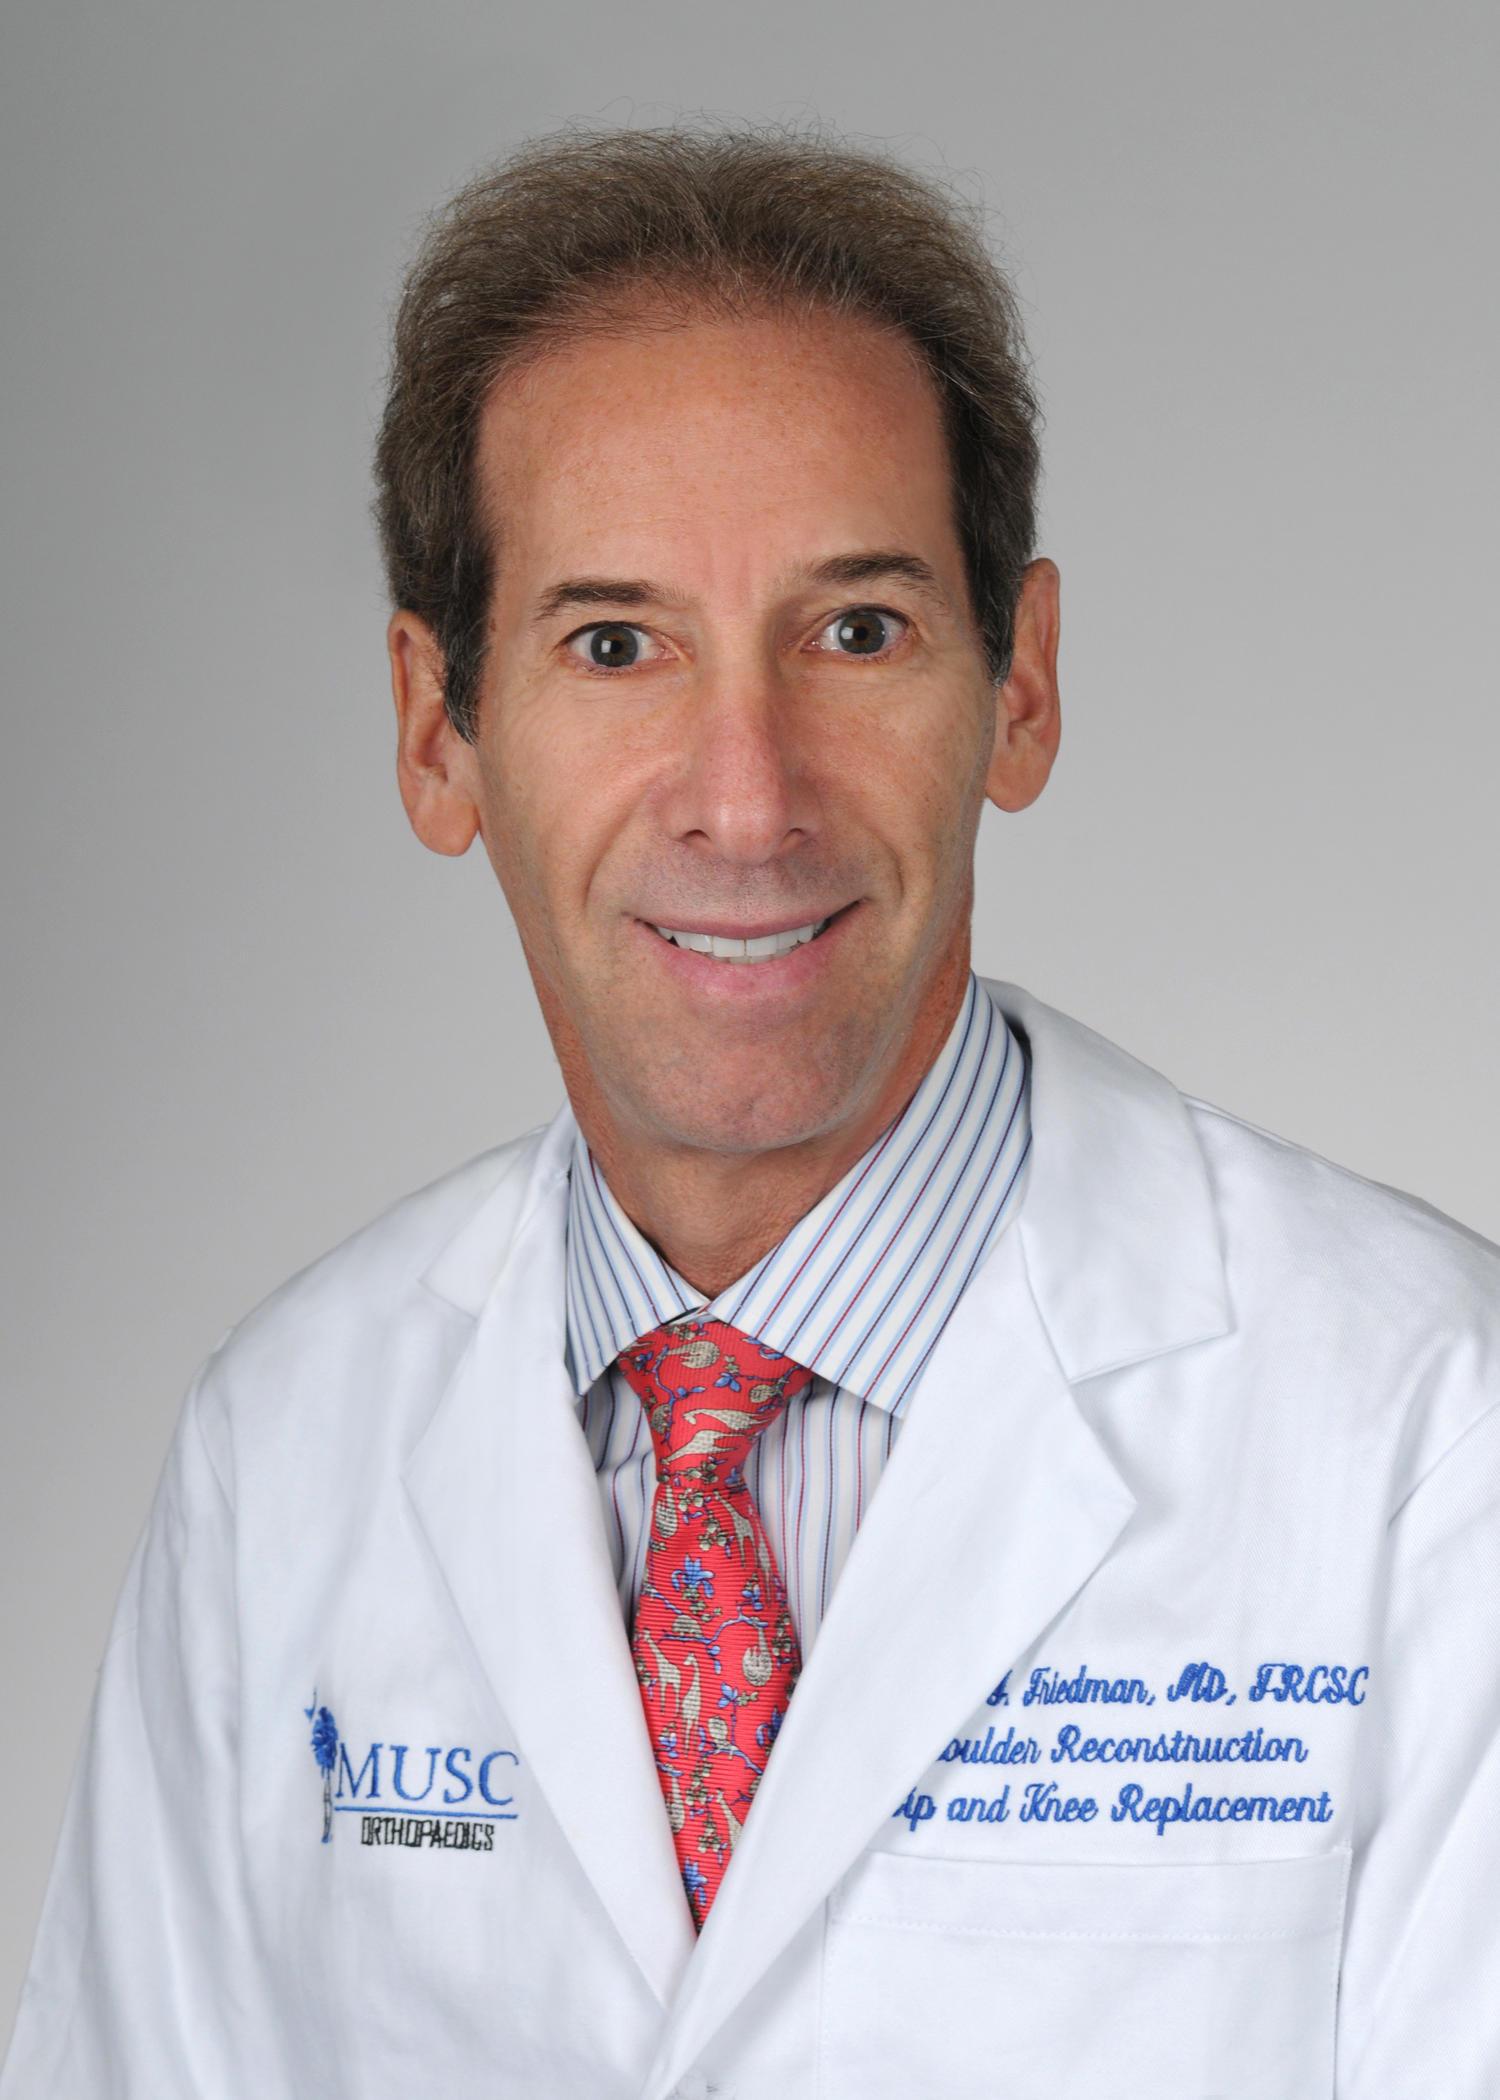 Richard J Friedman, MD